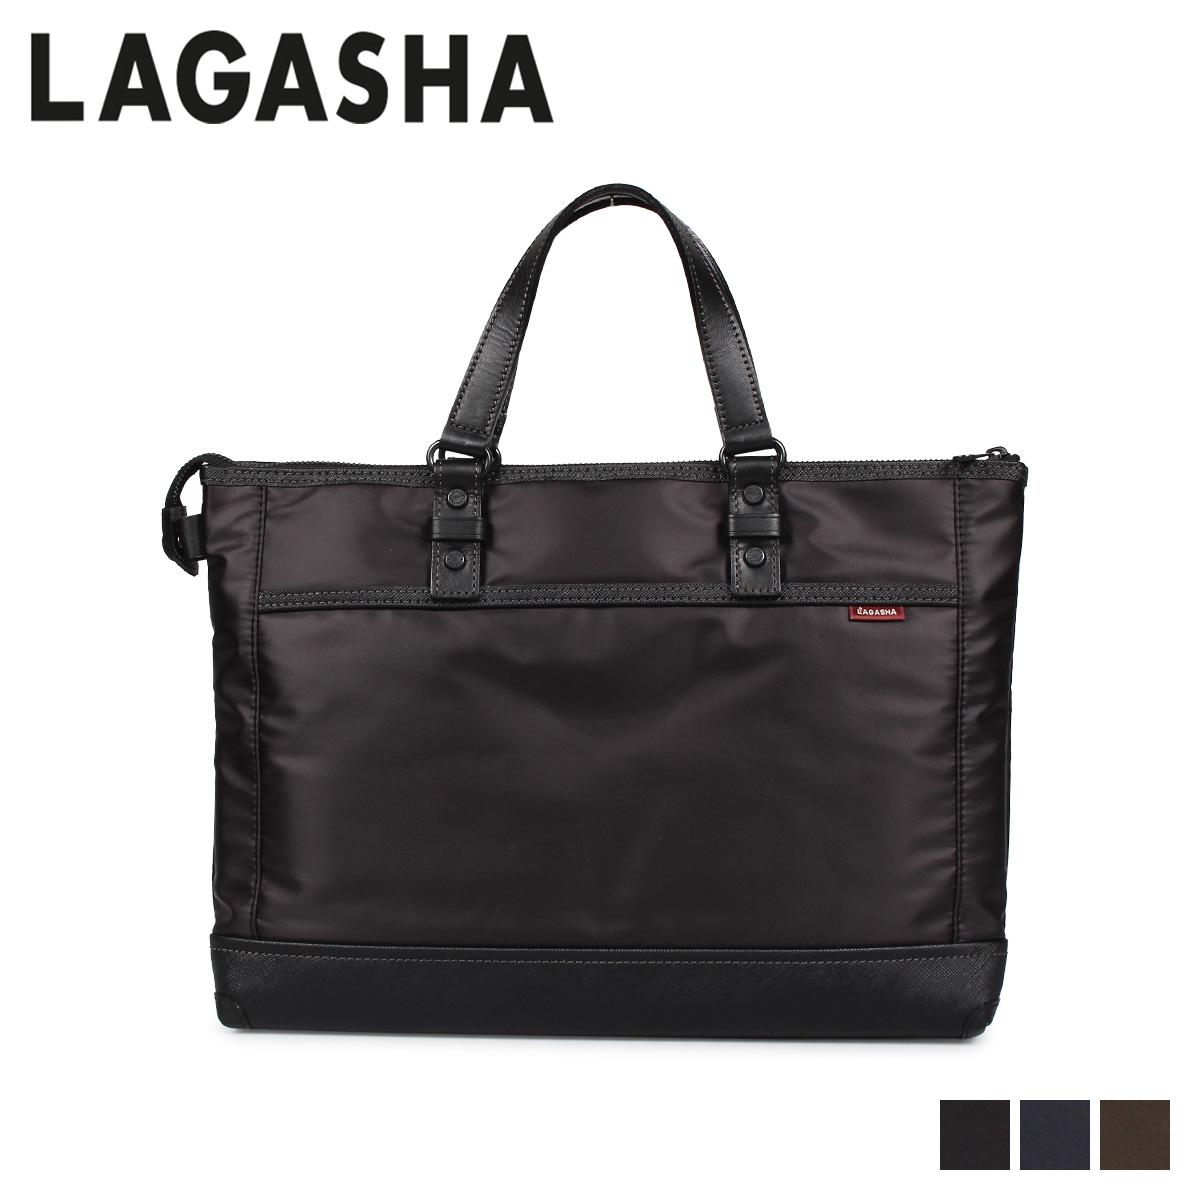 LAGASHA UPLIGHT ラガシャ アップライト バッグ ビジネスバッグ ブリーフケース メンズ ブラック ネイビー カーキ 黒 7227